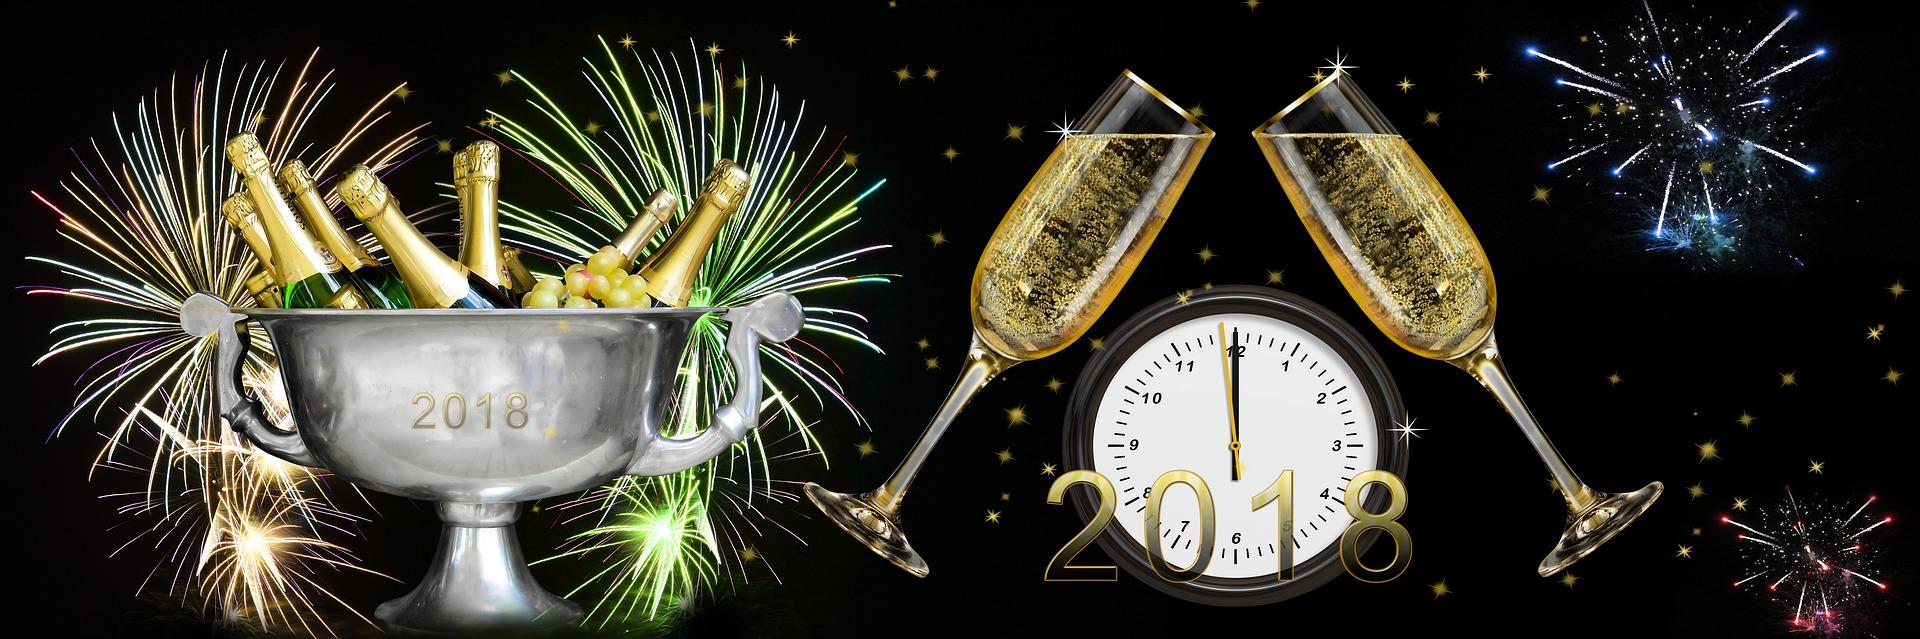 11 powerful ways to make 2018 successful & fulfilling!